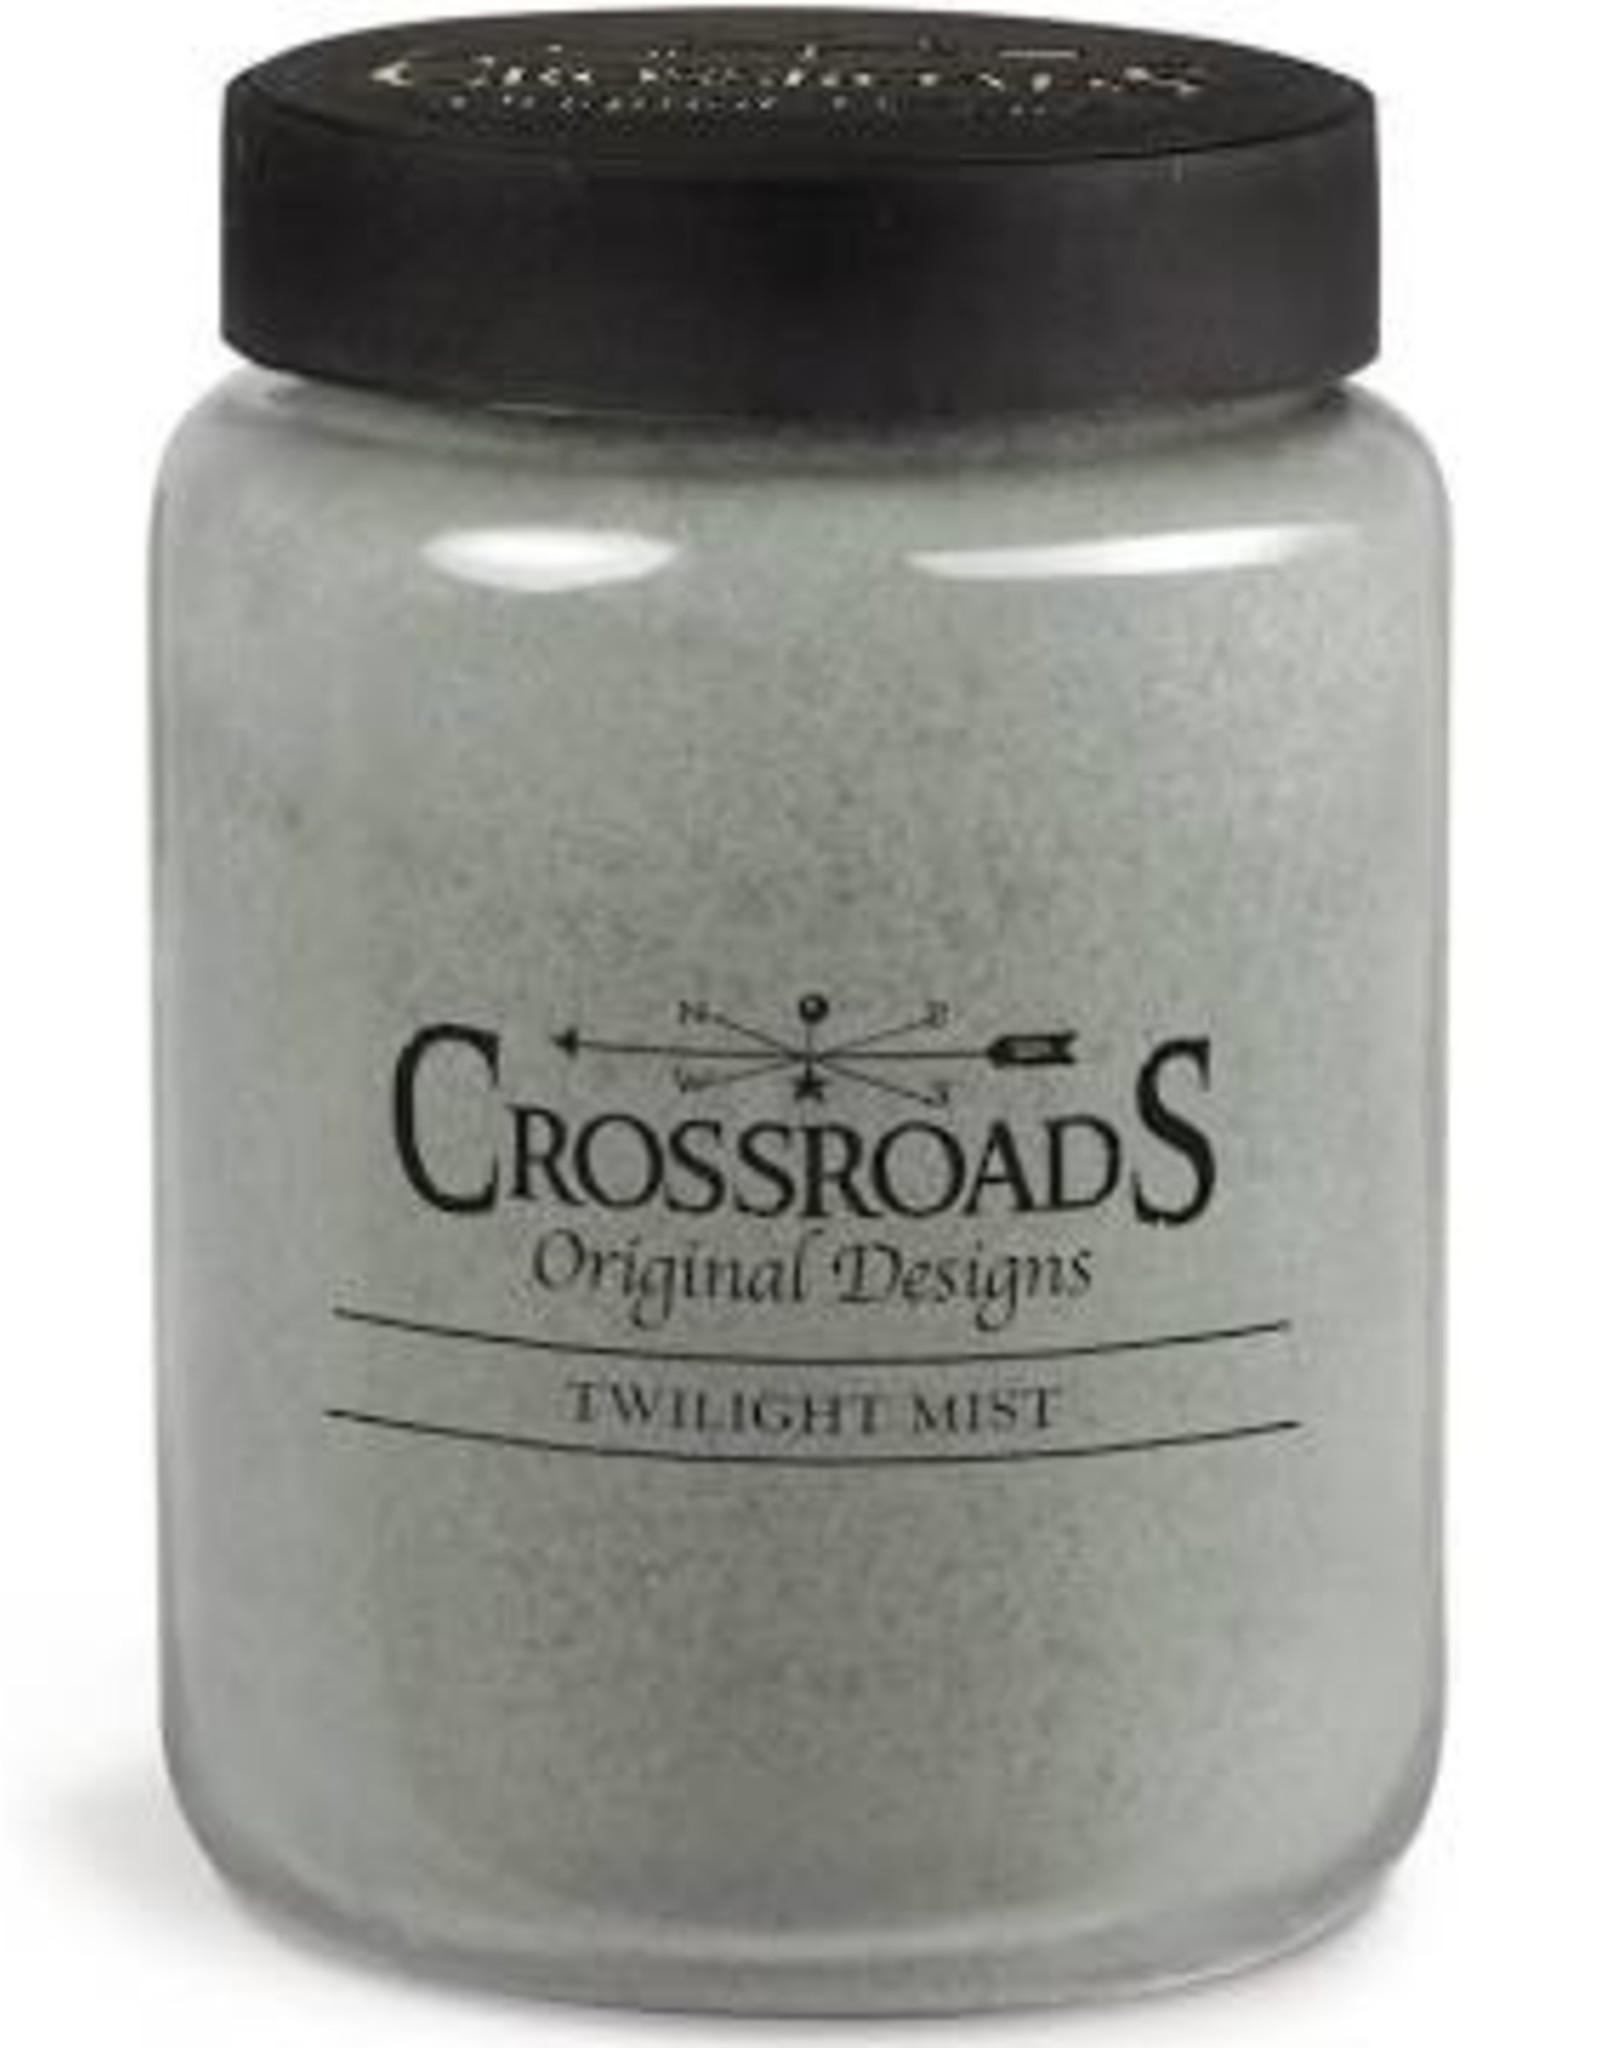 Crossroads Twilight Mist 26oz Candle